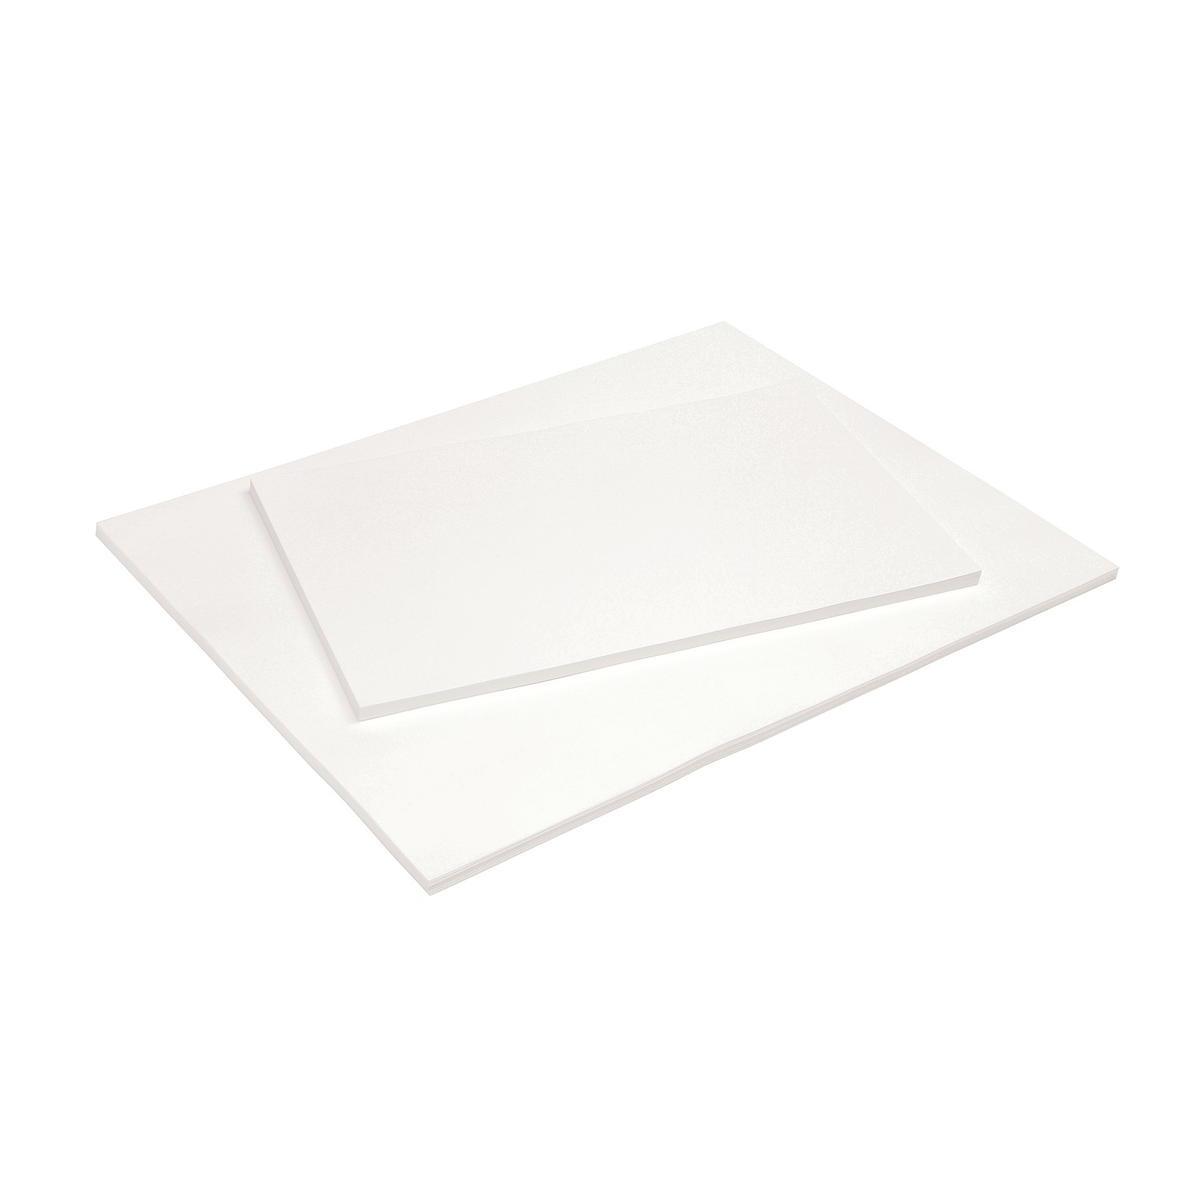 Blotting Paper Full Demy W570xD445mm Flat White 50 Sheets